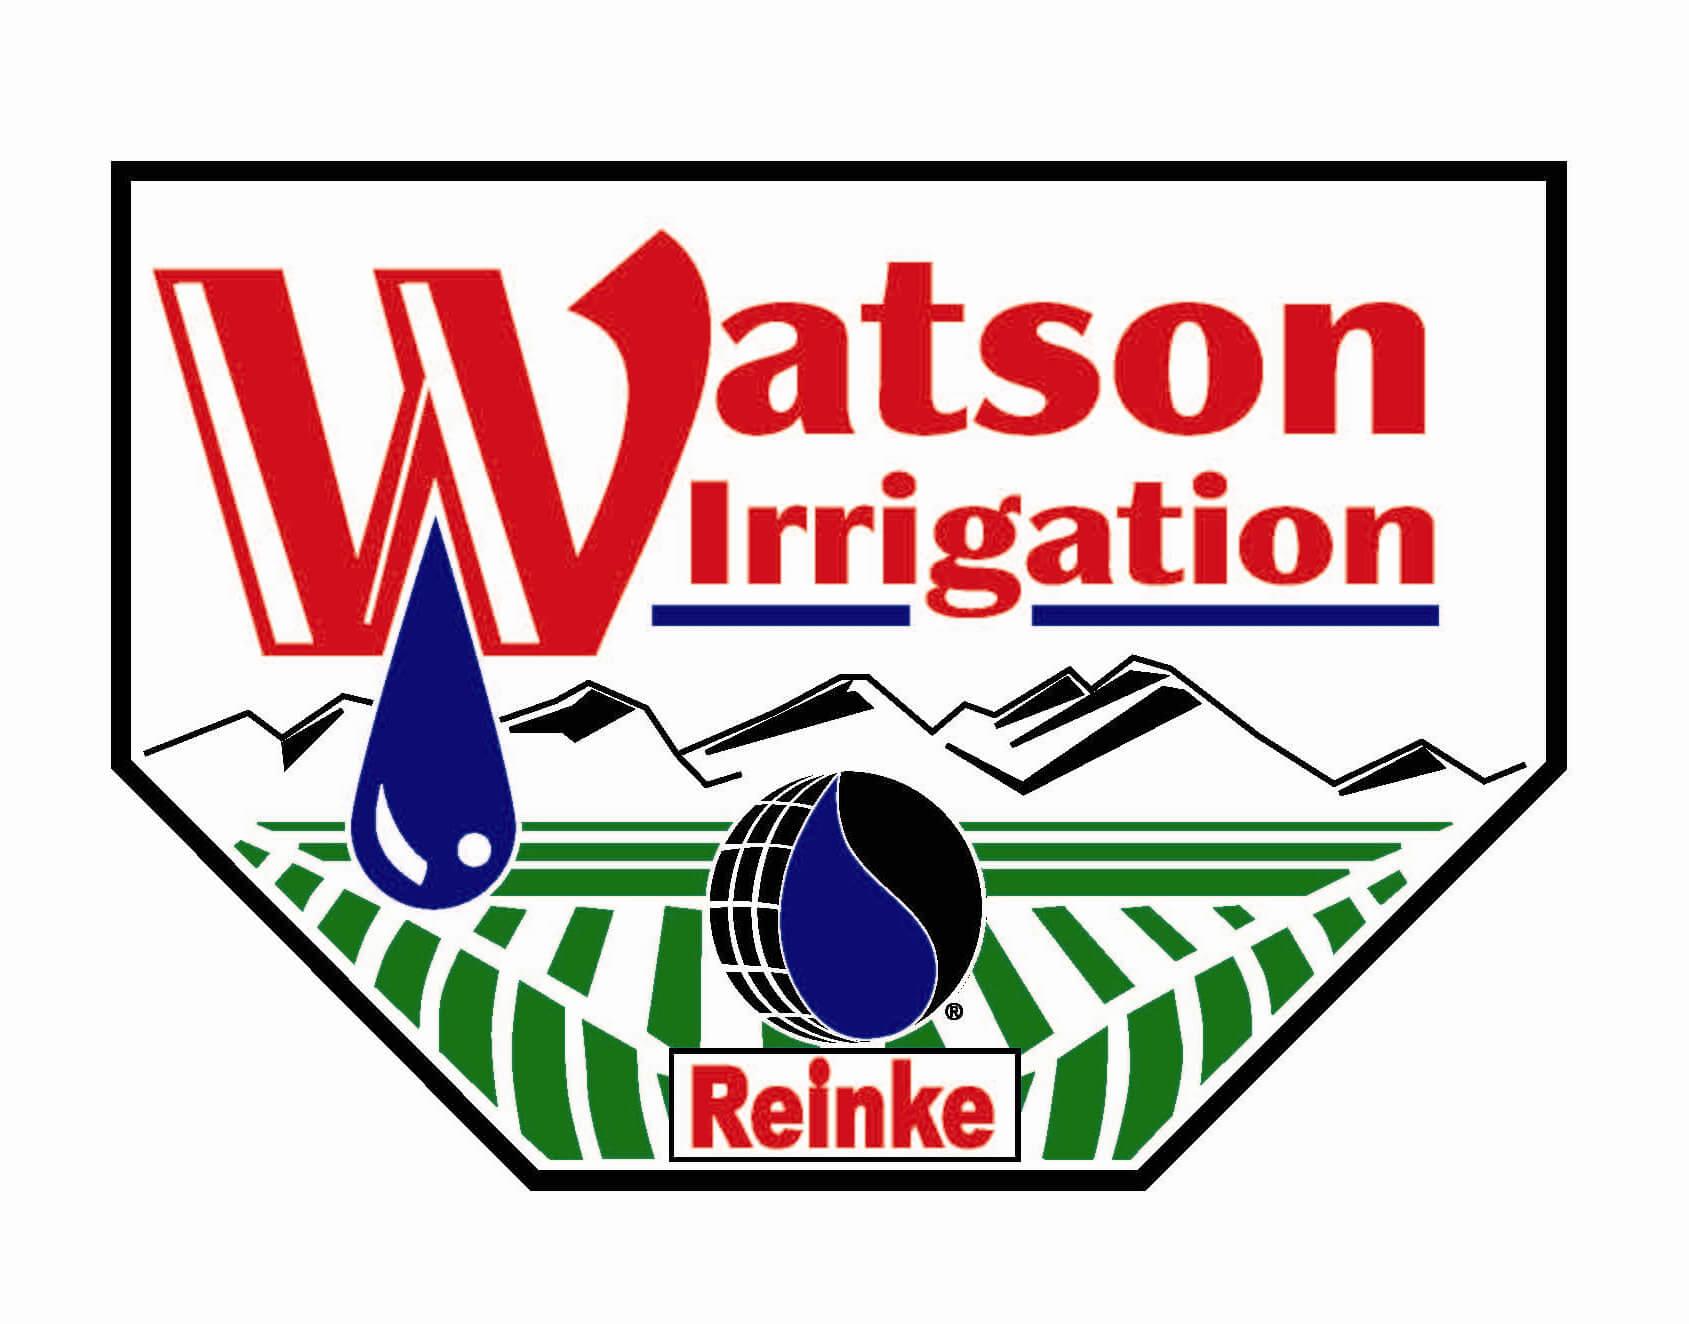 Watson Irrigation - AGAI Sponsor